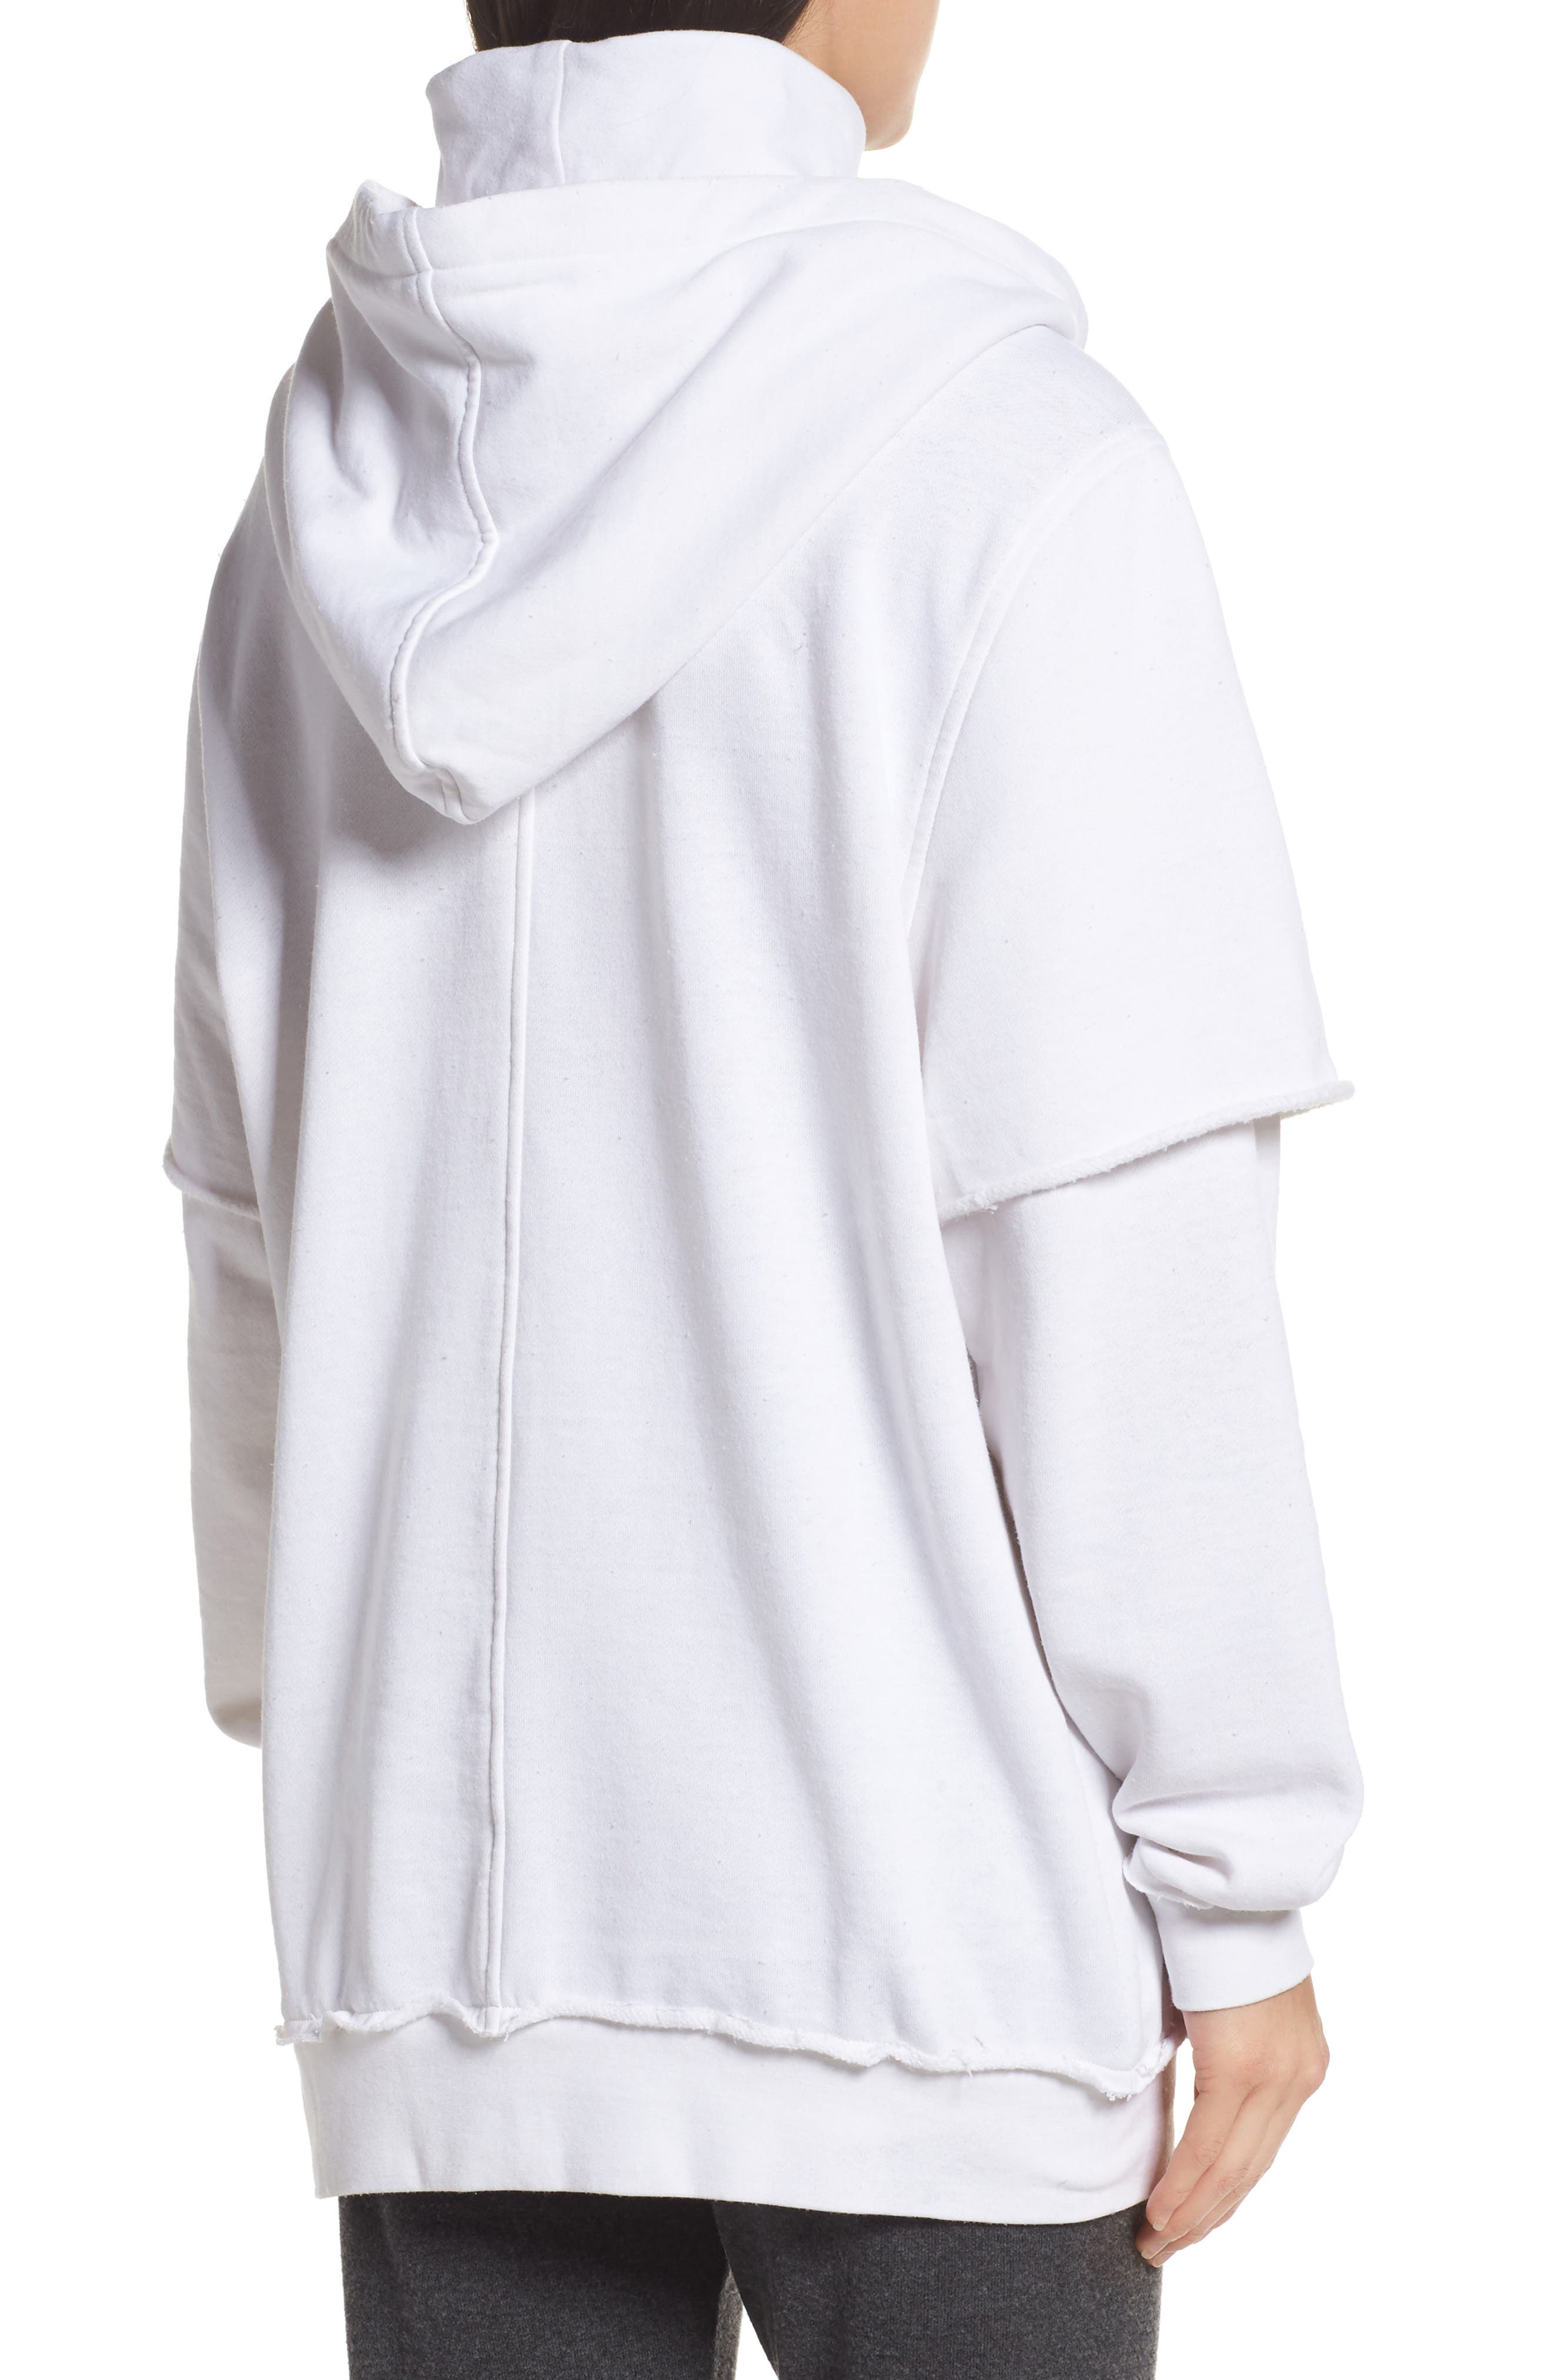 Good Hood Sweatshirt Dress,                             Alternate thumbnail 2, color,                             White